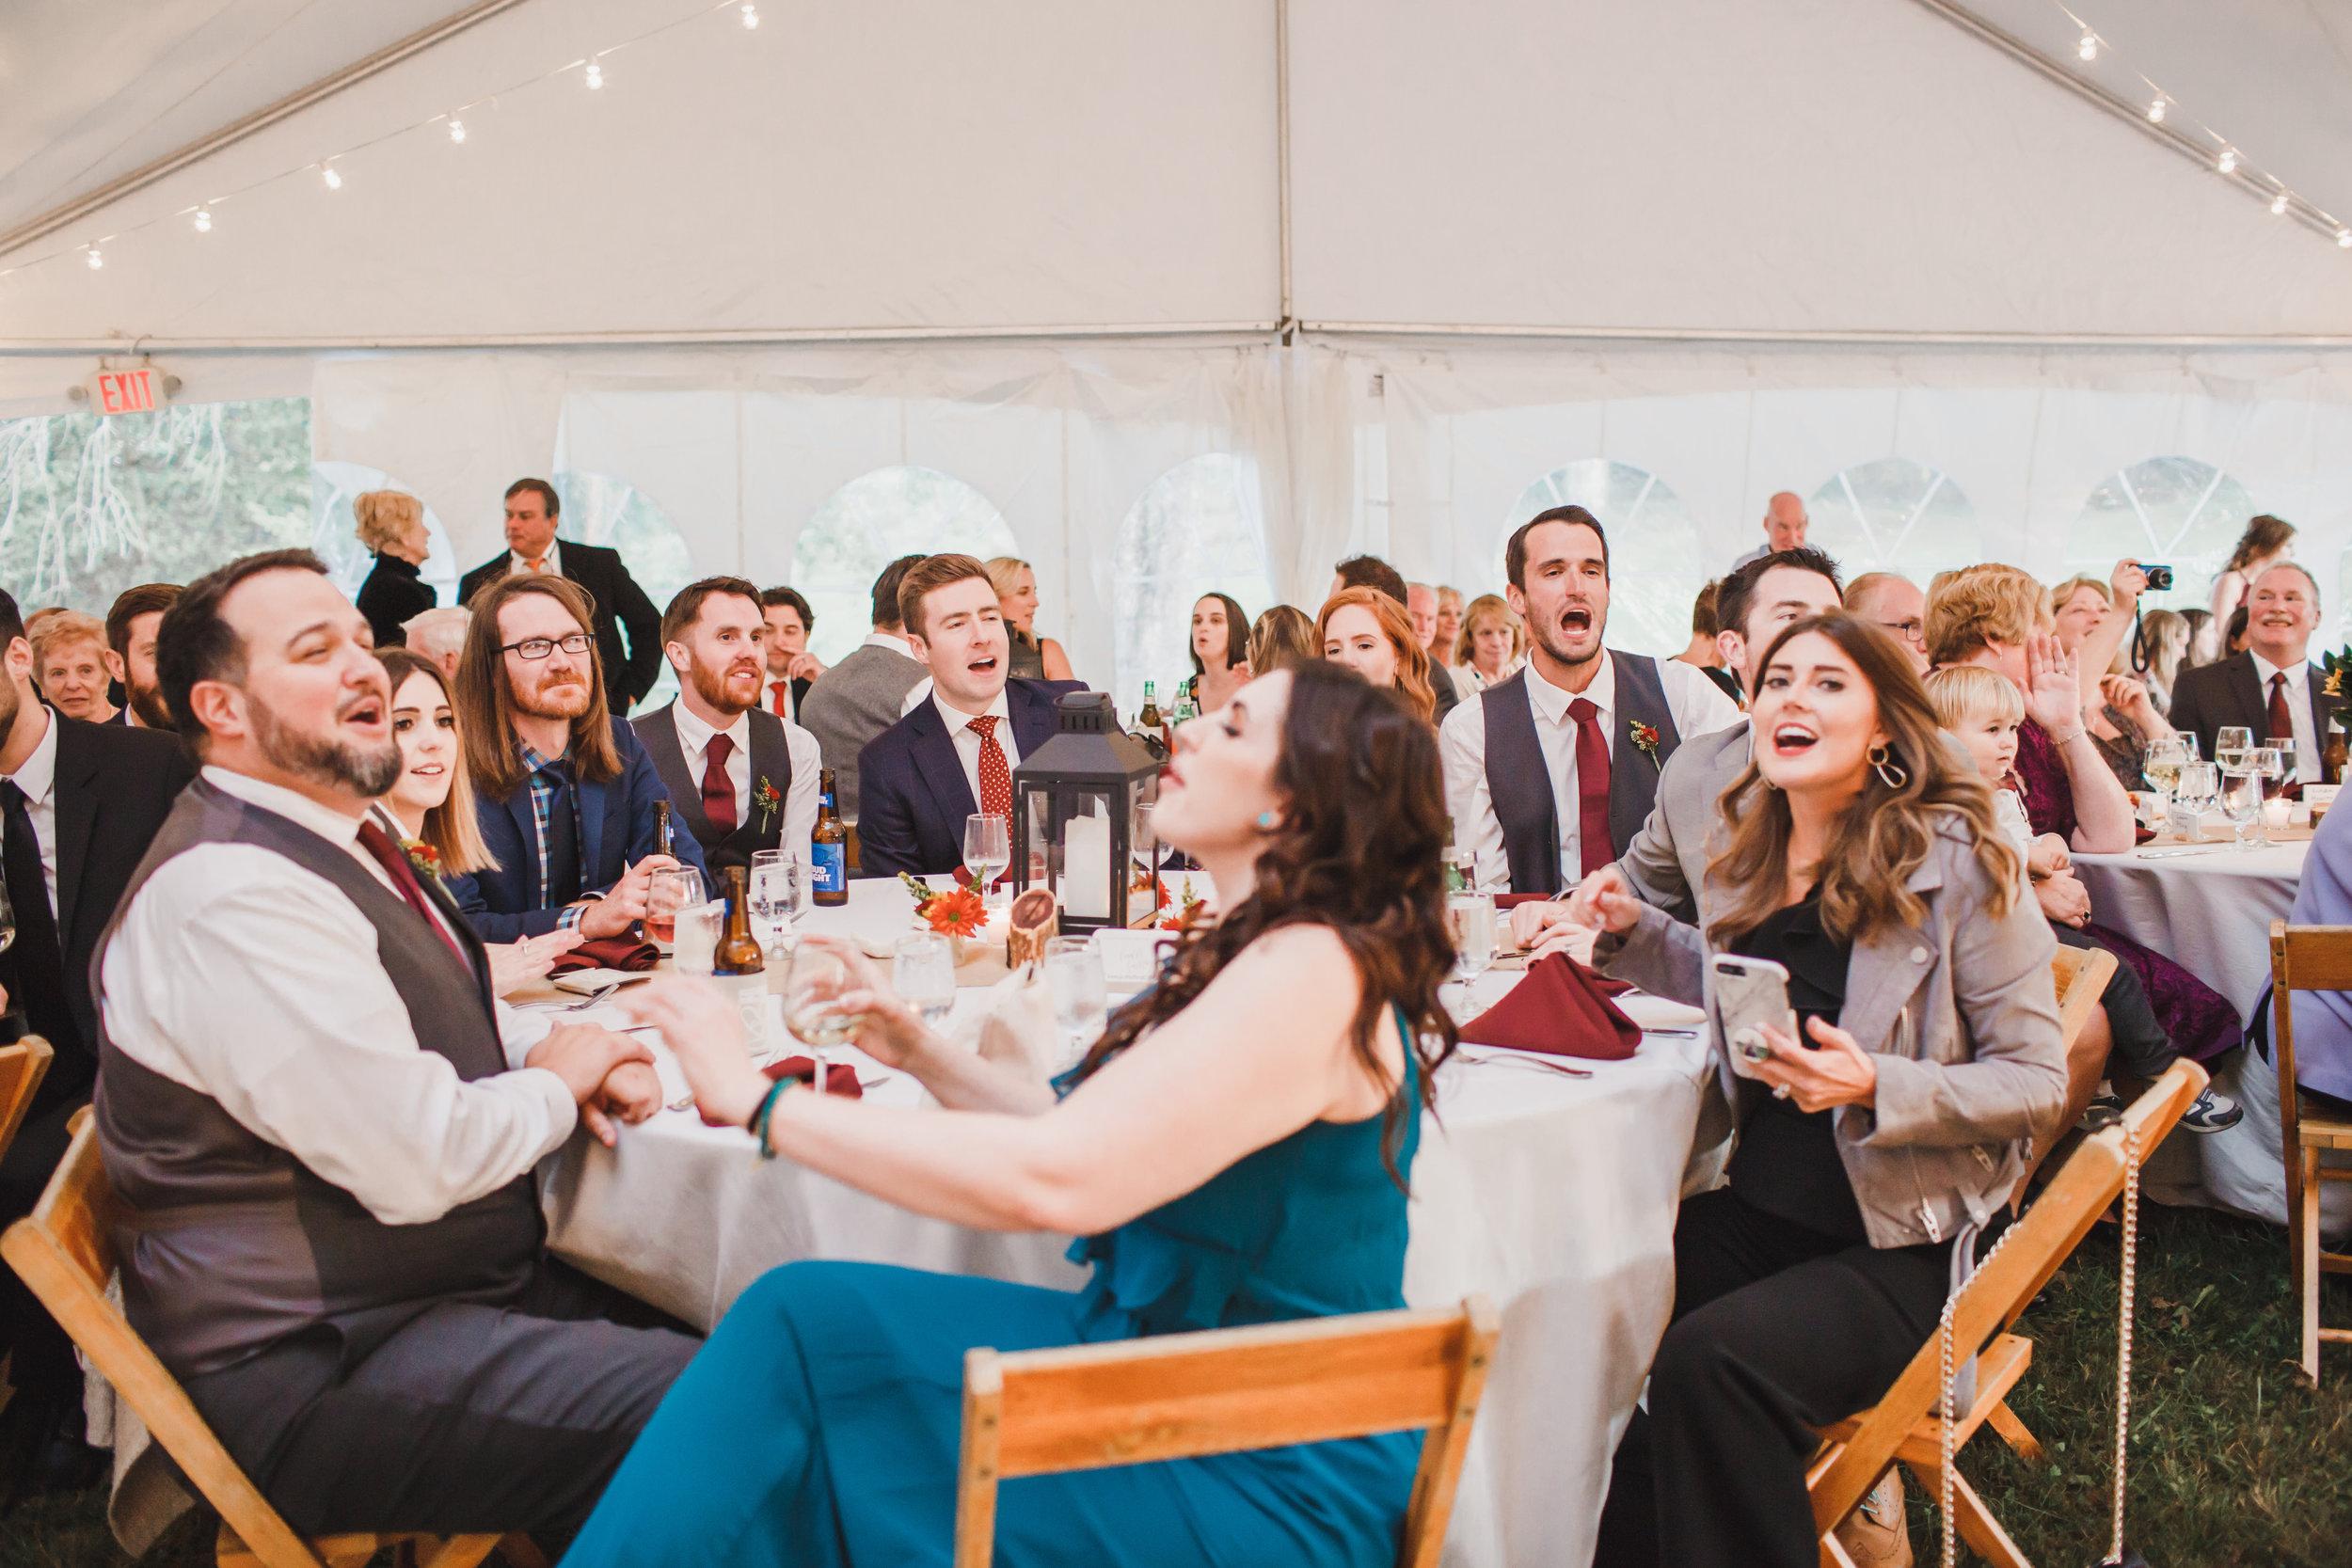 Fling - Virginia Wedding Photographer - Photography by Amy Nicole-4583-6.jpg